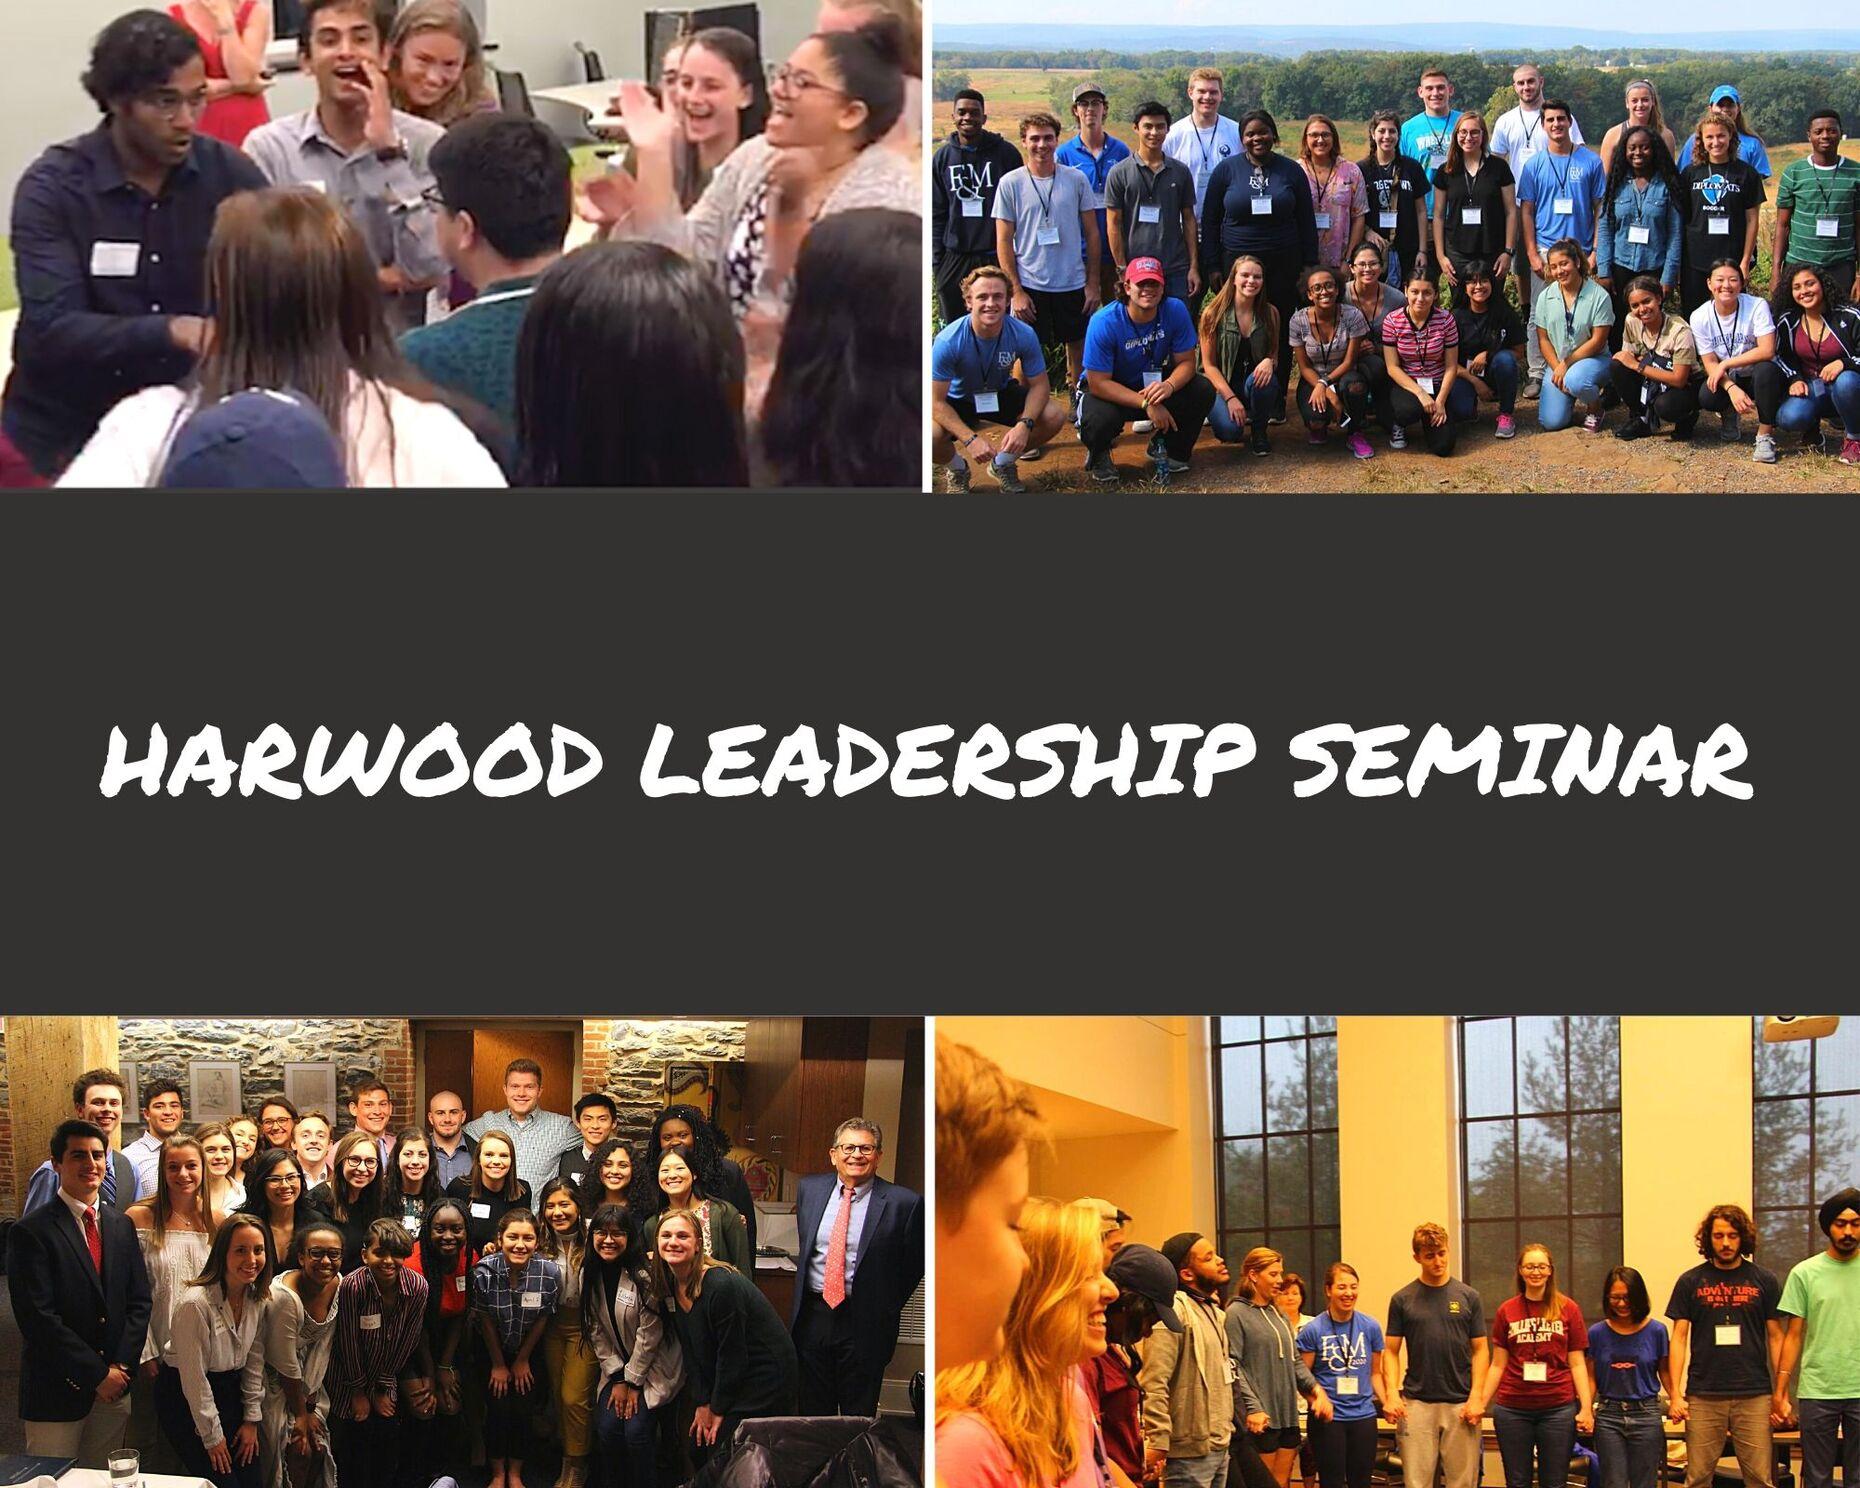 Harwood Leadership Seminar Graphic